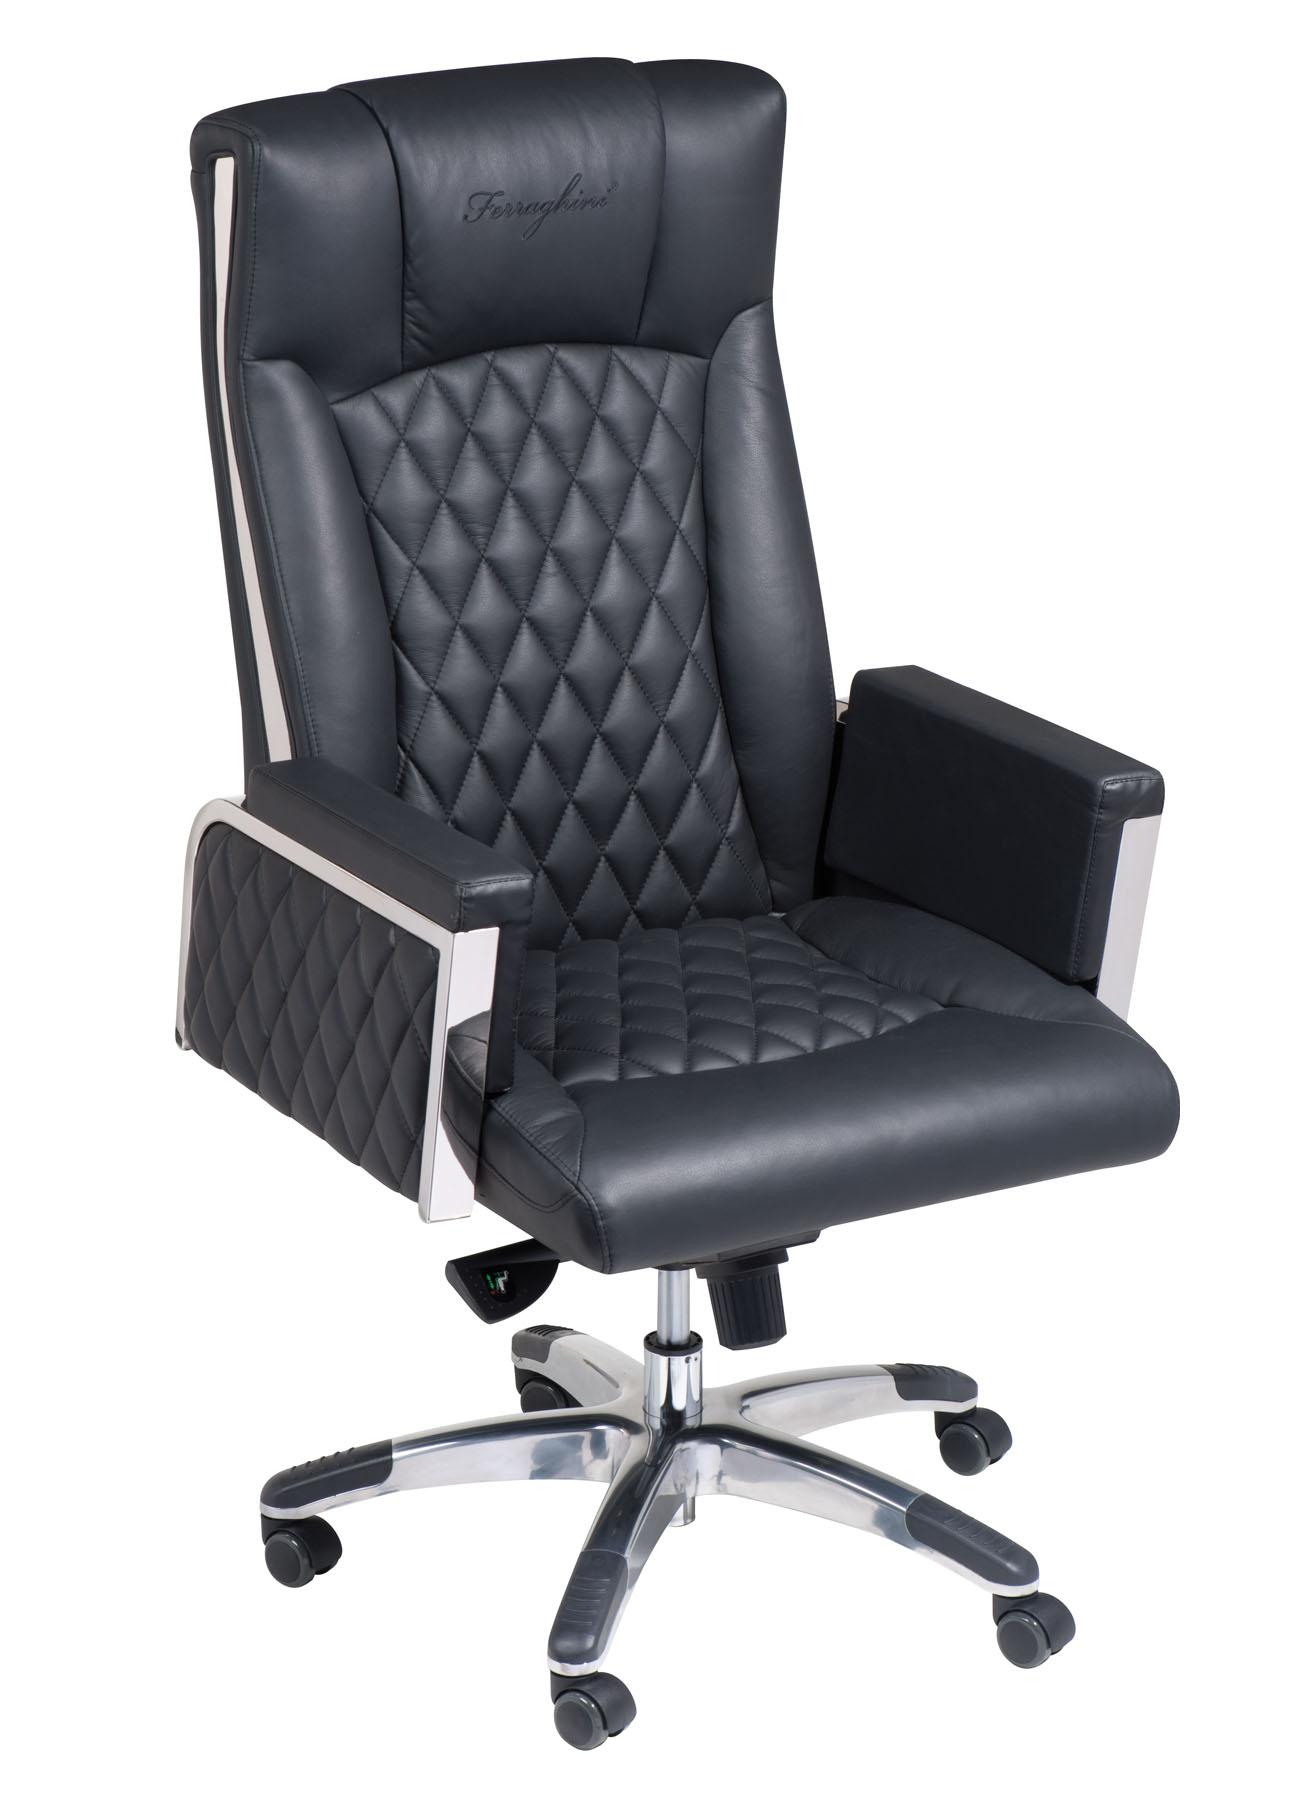 Luxus bürostuhl  Ferraghini® Luxus-Bürostuhl « Merkur Werbemittel